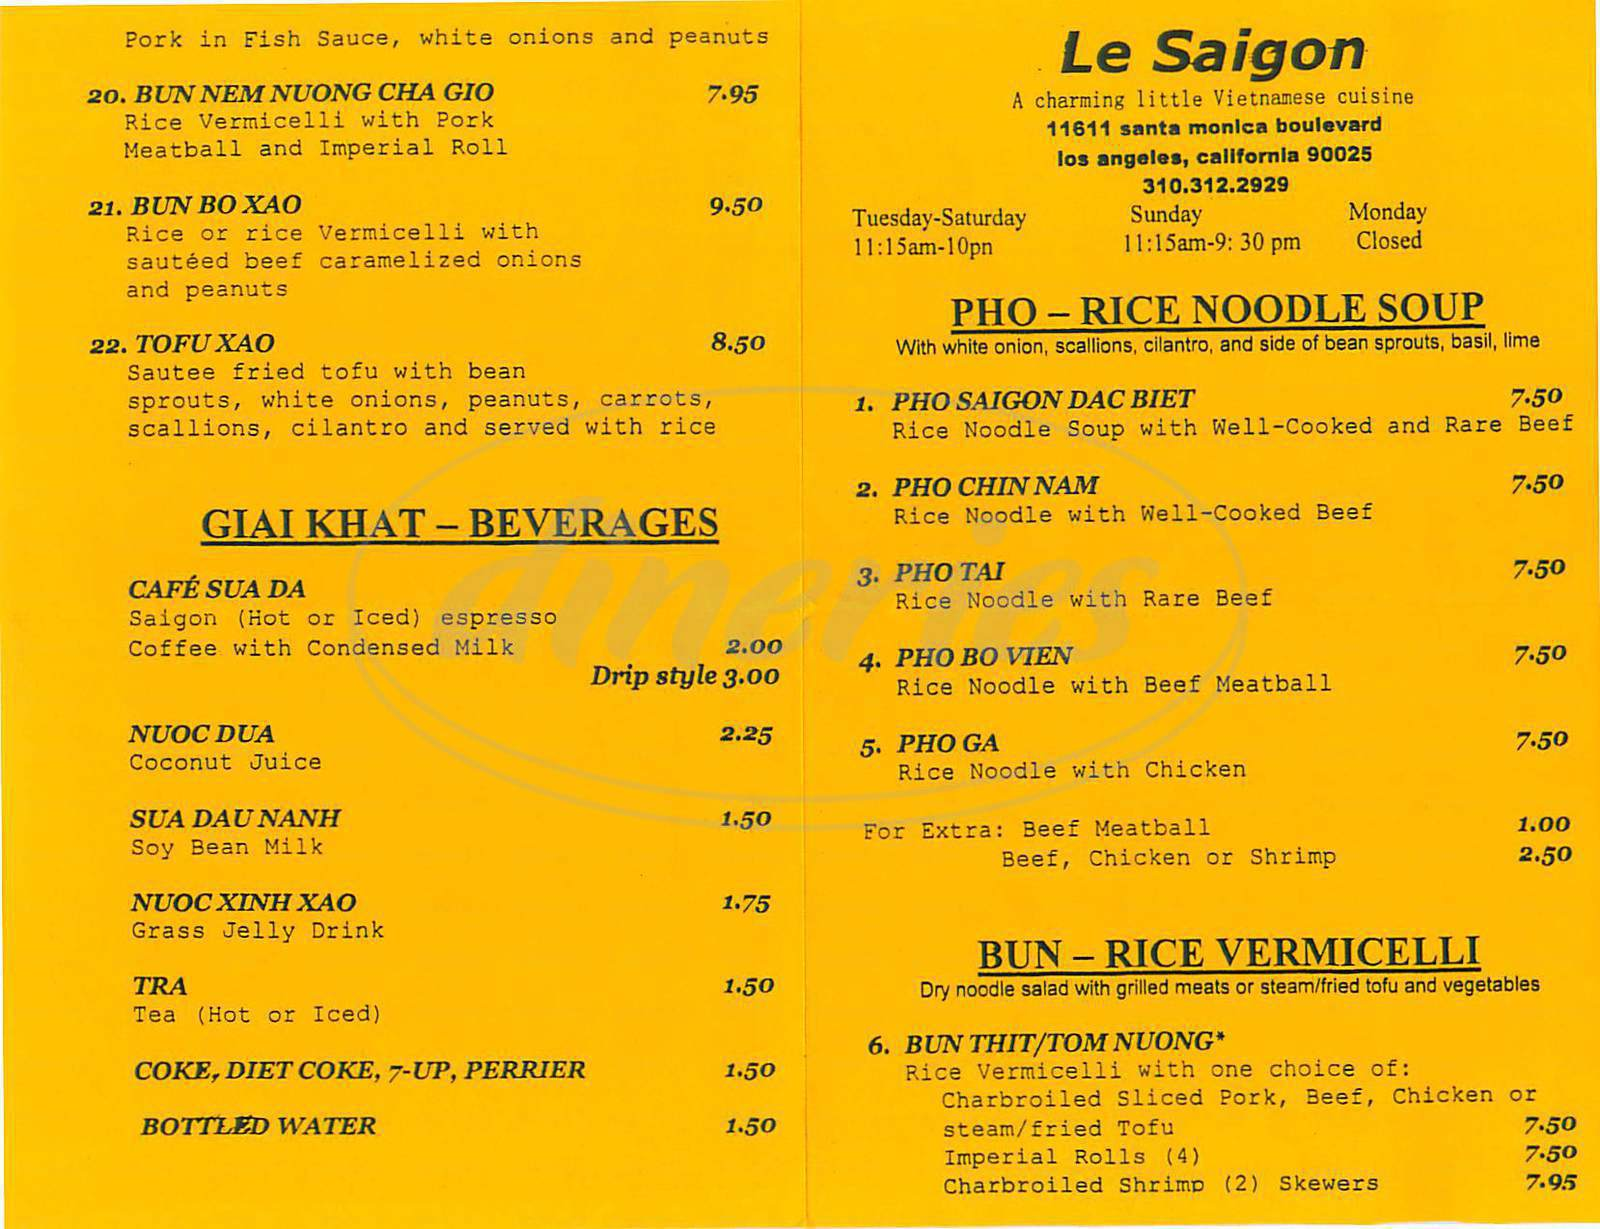 menu for Le Saigon